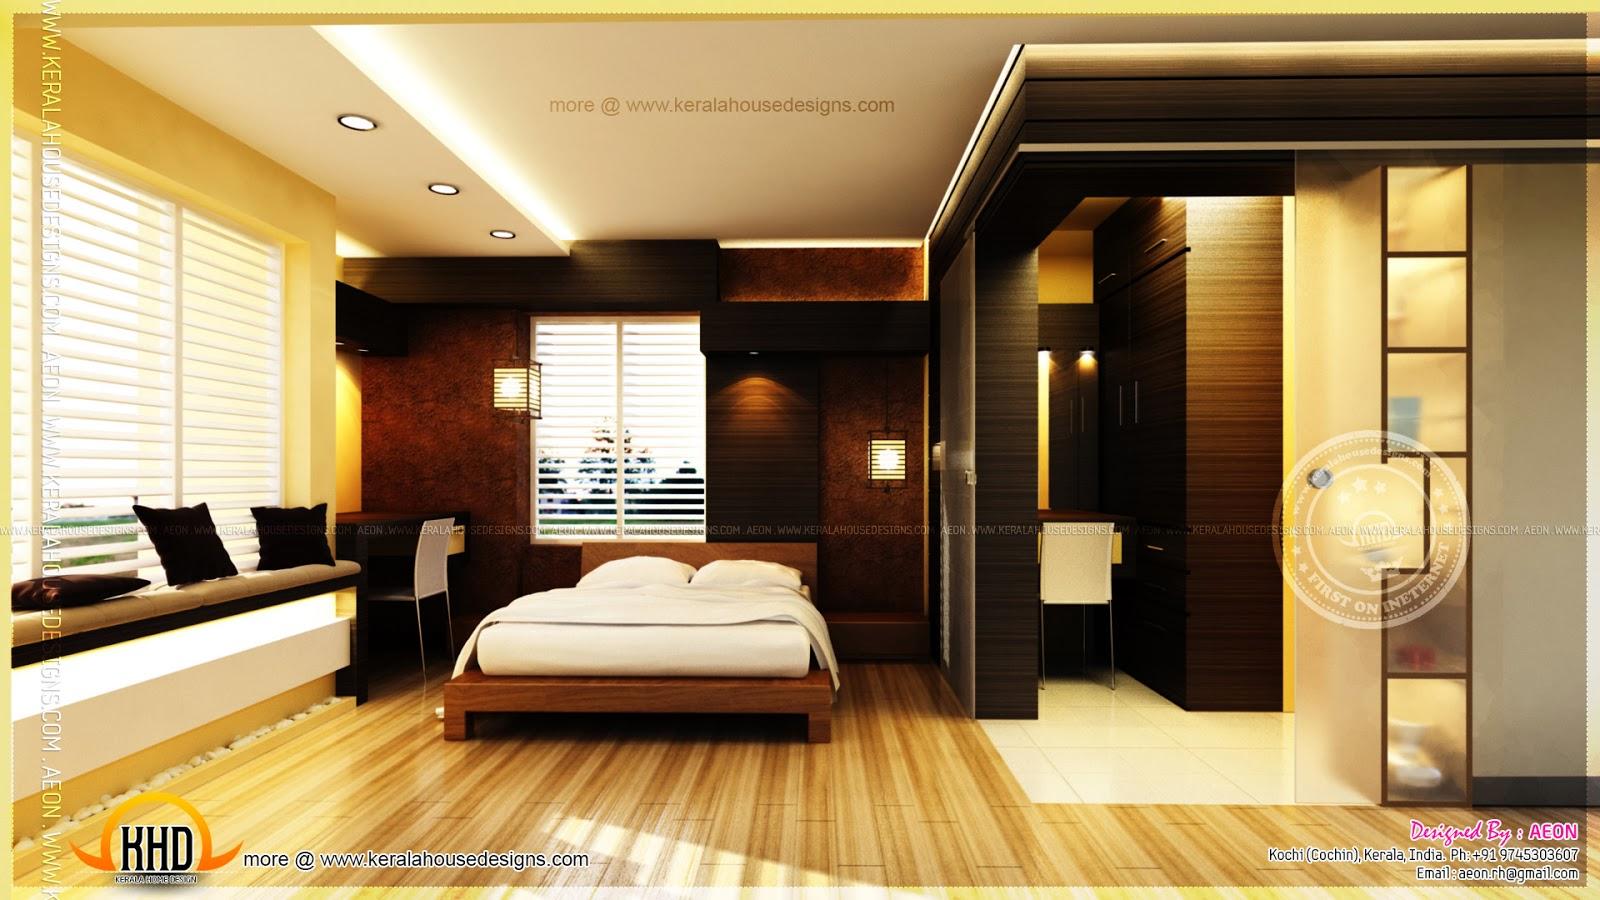 Apartment Interior Designs By AEON Cochin Kerala Home